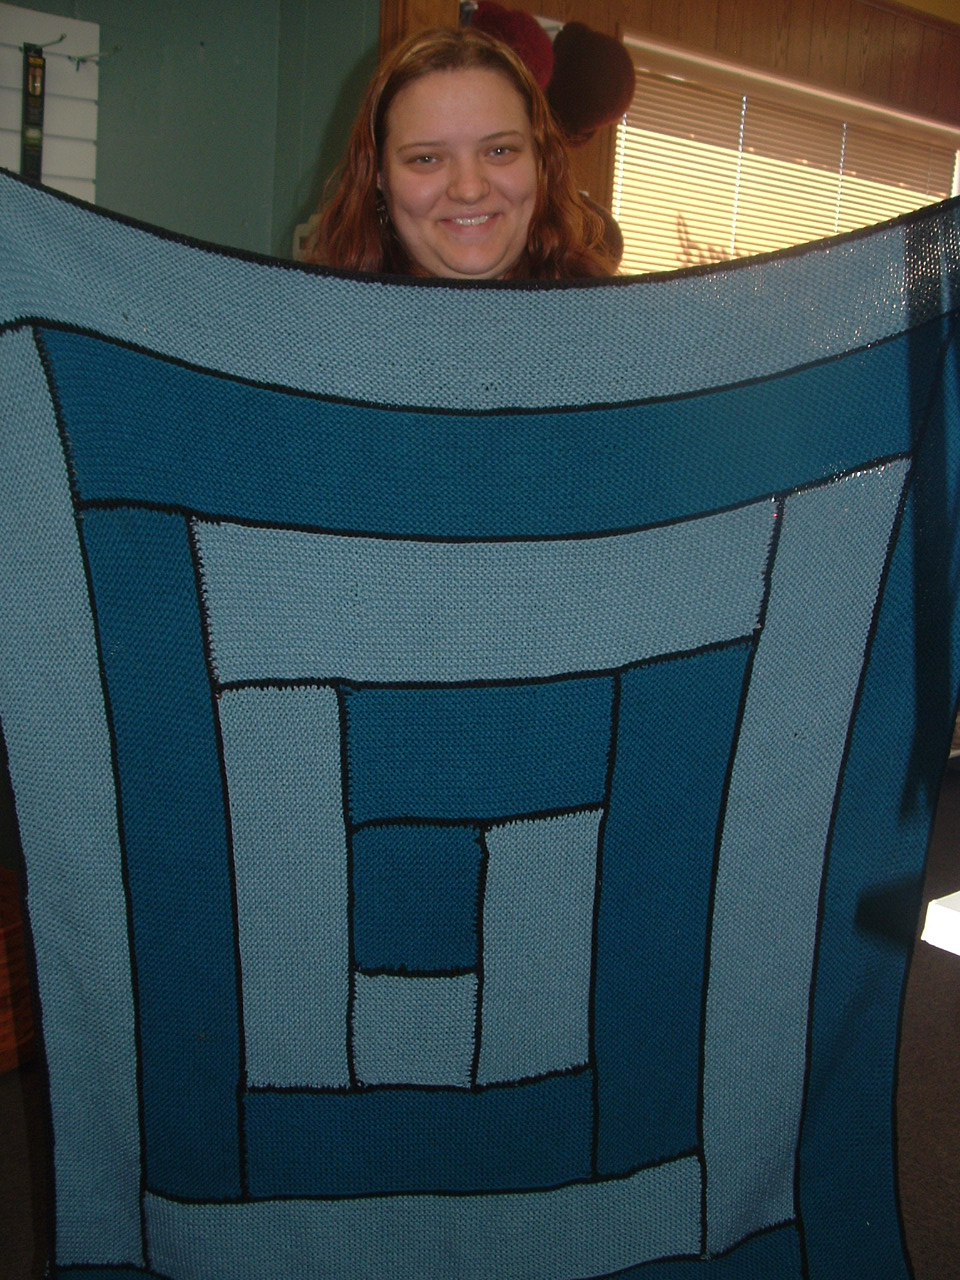 Amanda's blanket